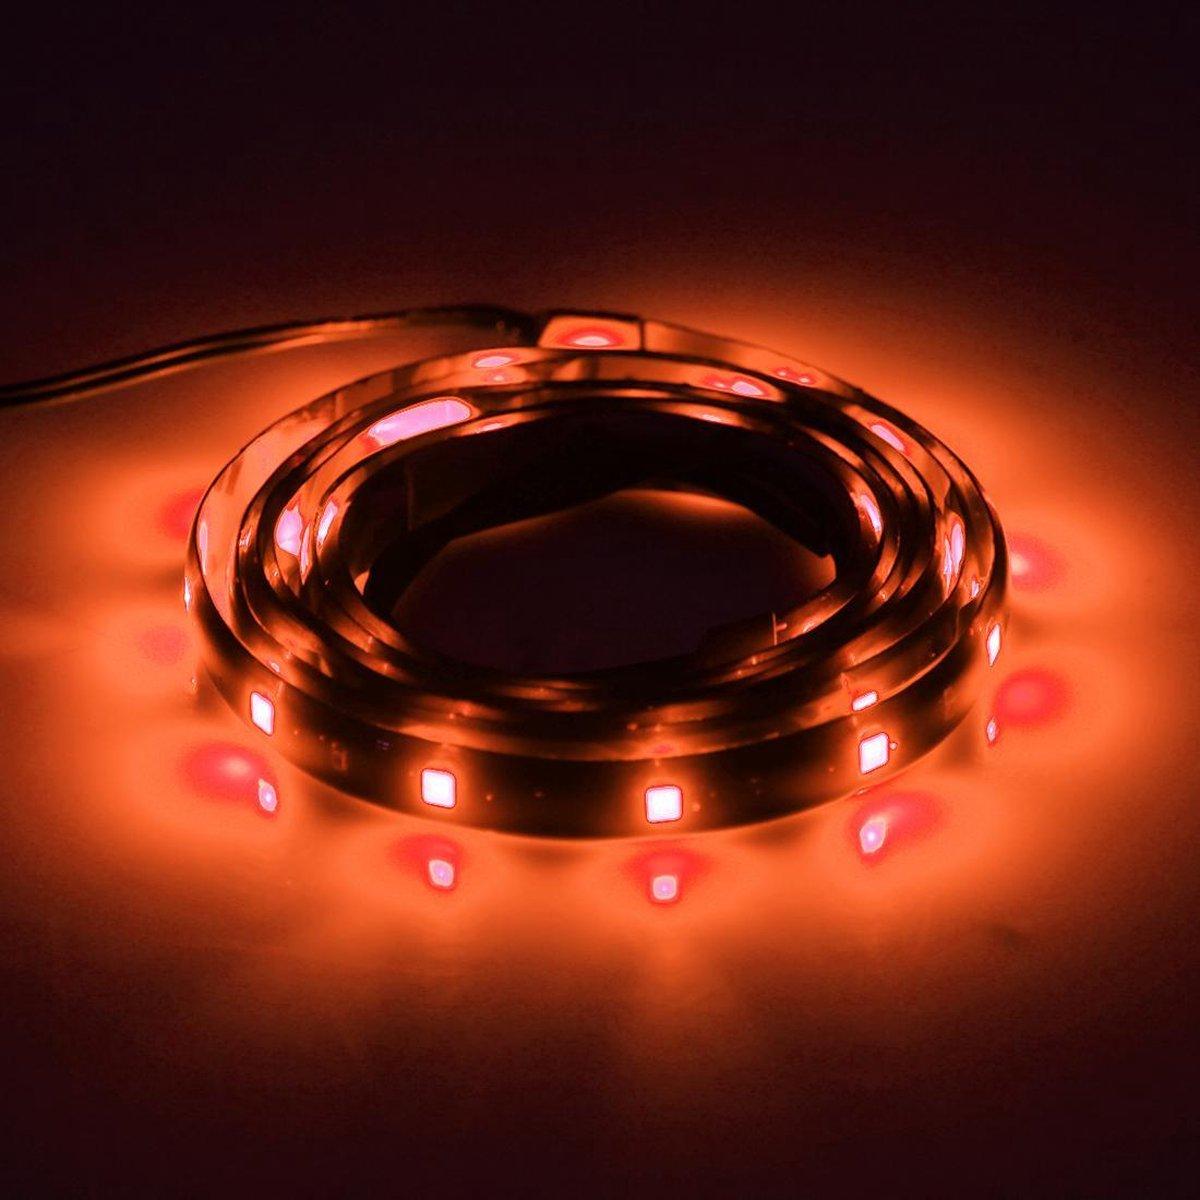 10 STKS 30 cm 15 LED Waterdichte Flexibele Auto Strip Licht, DC 12 V (Oranje Licht)